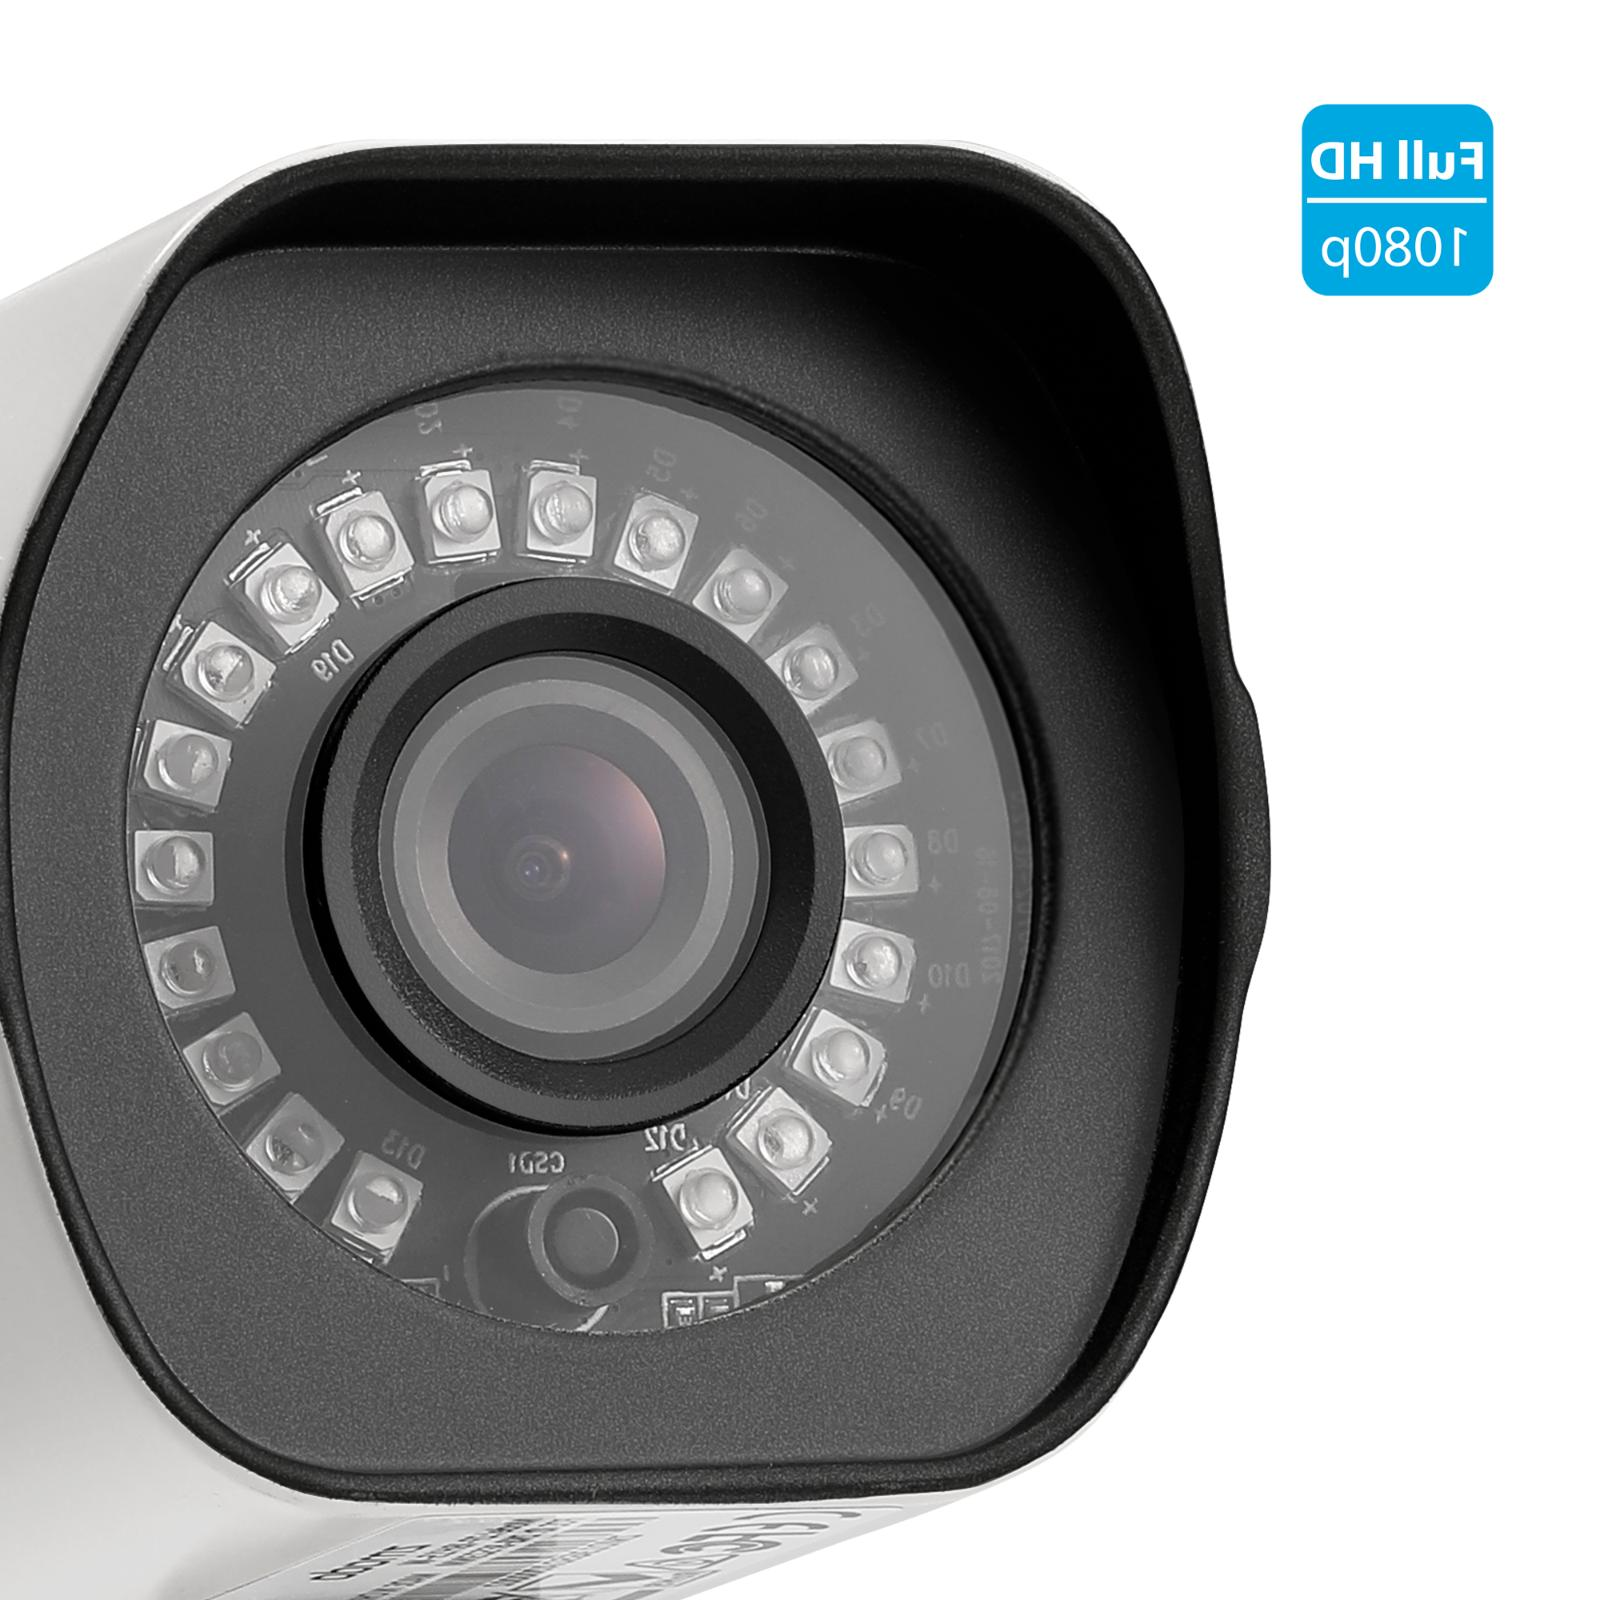 Zmodo 1080p Home Remote